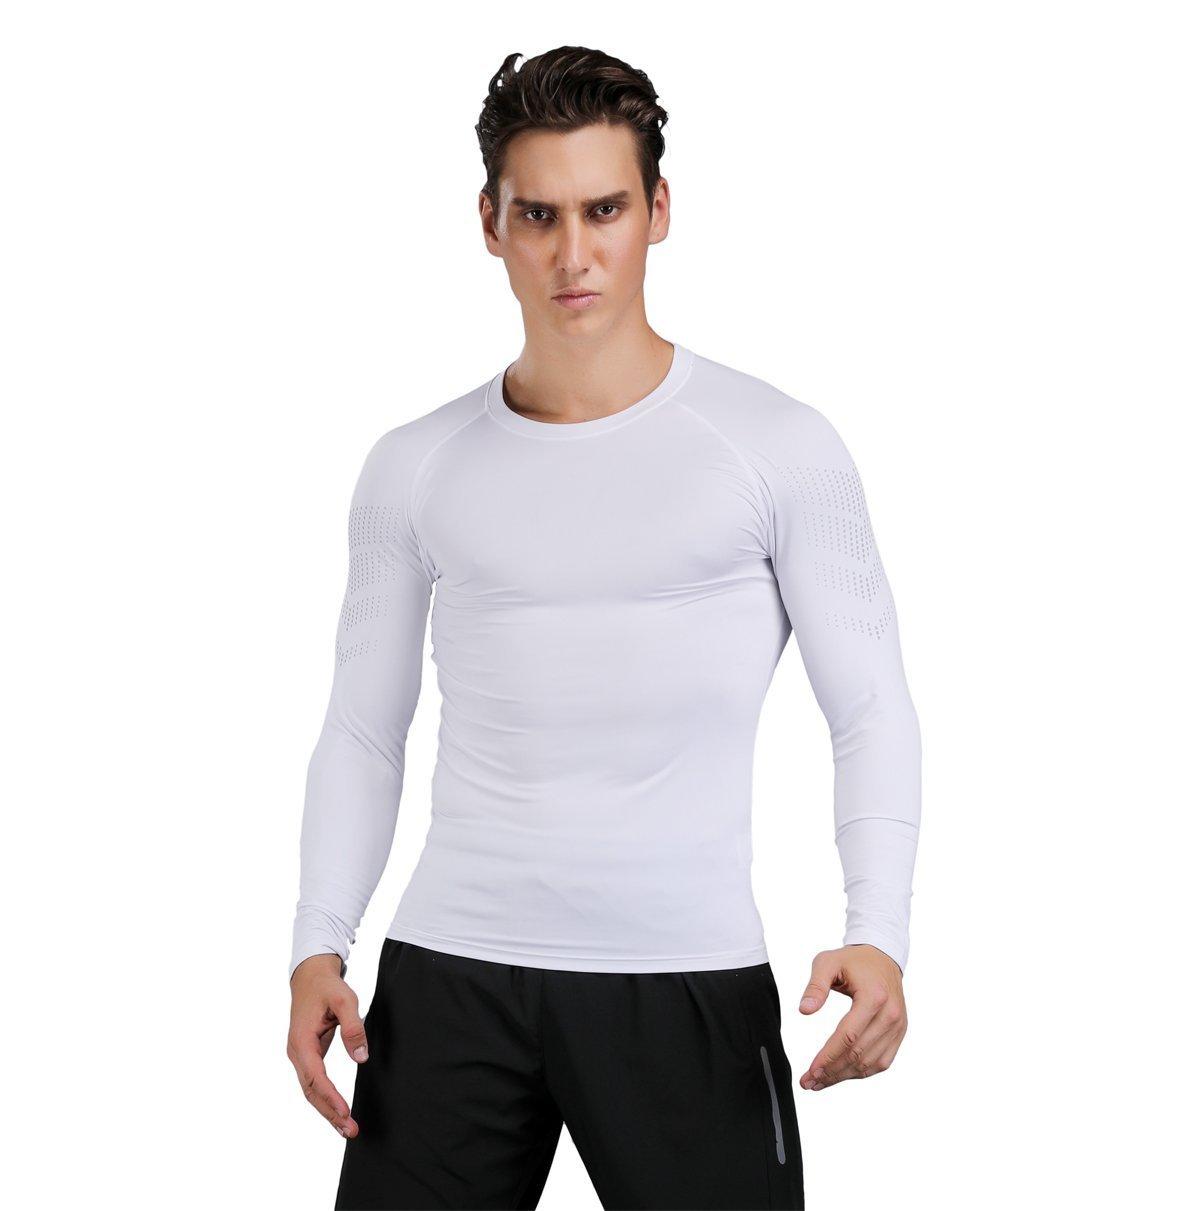 LIERDAR Men's Long Sleeve Running Workout Compression Baselayer Shirt White Gym Sport Shirt White 2X-Large